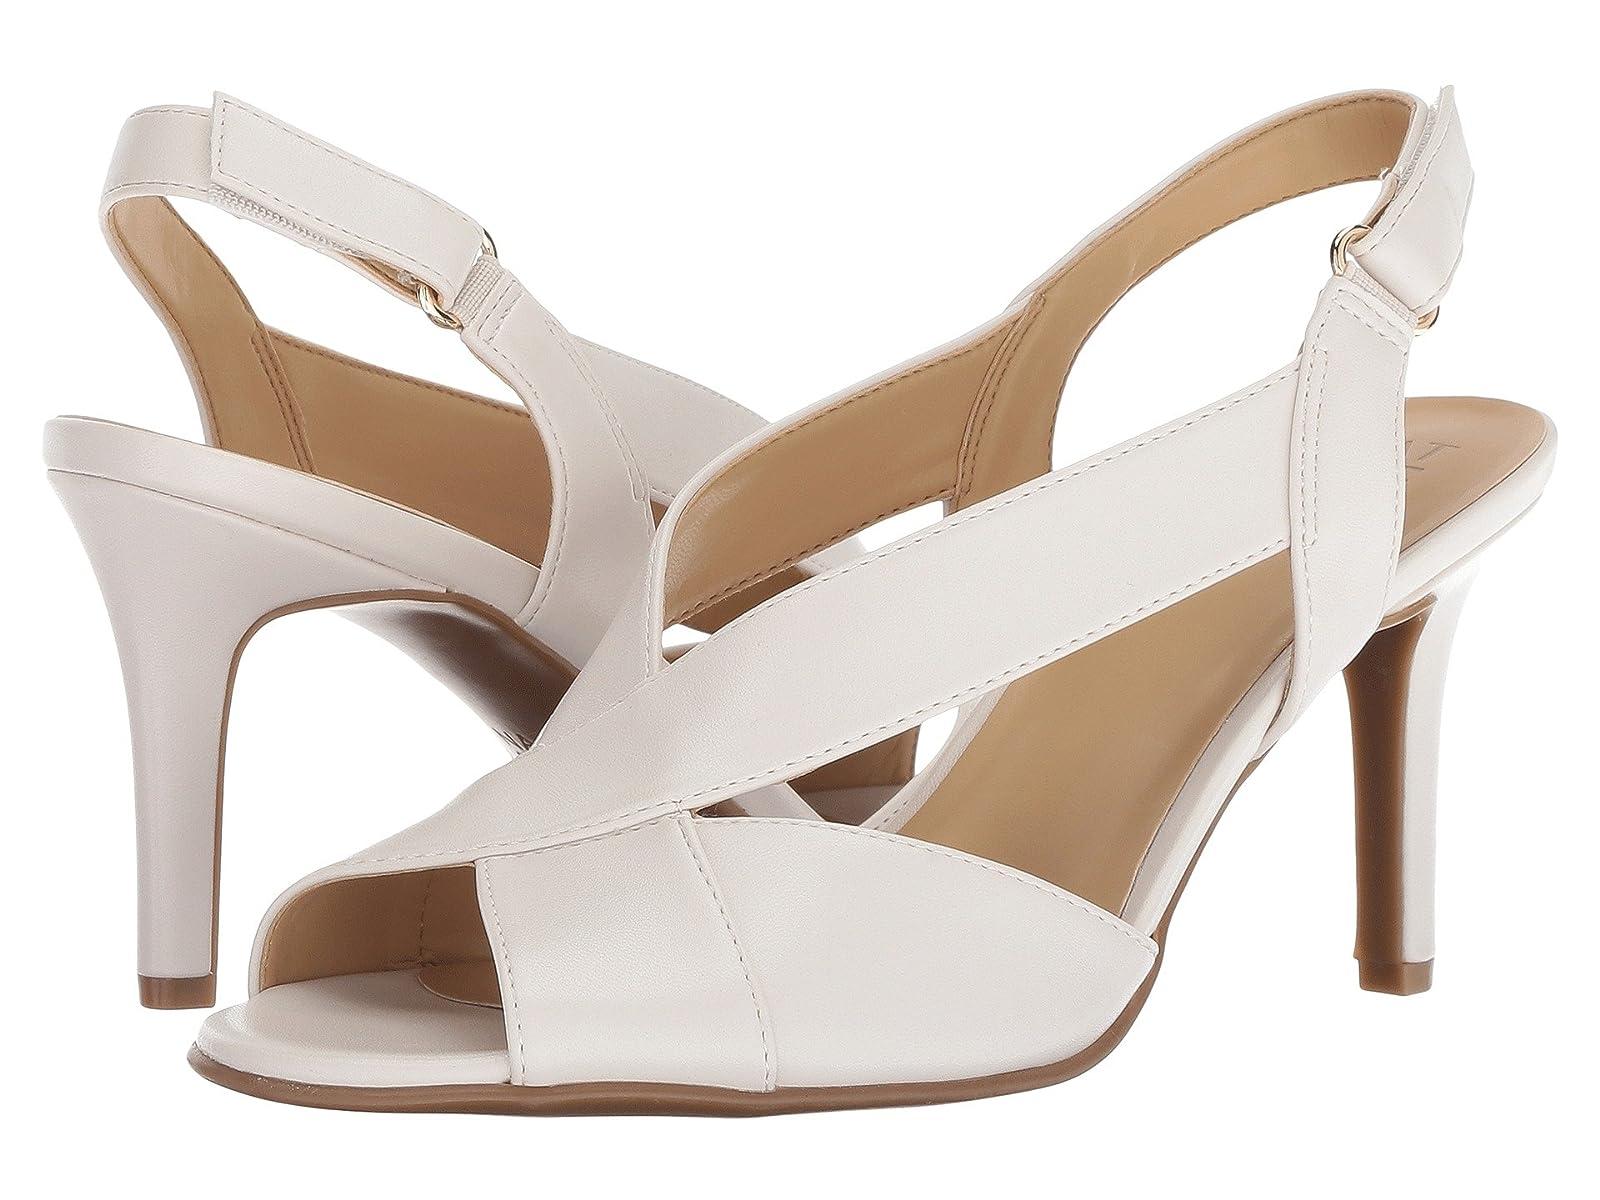 Naturalizer BarrieCheap and distinctive eye-catching shoes